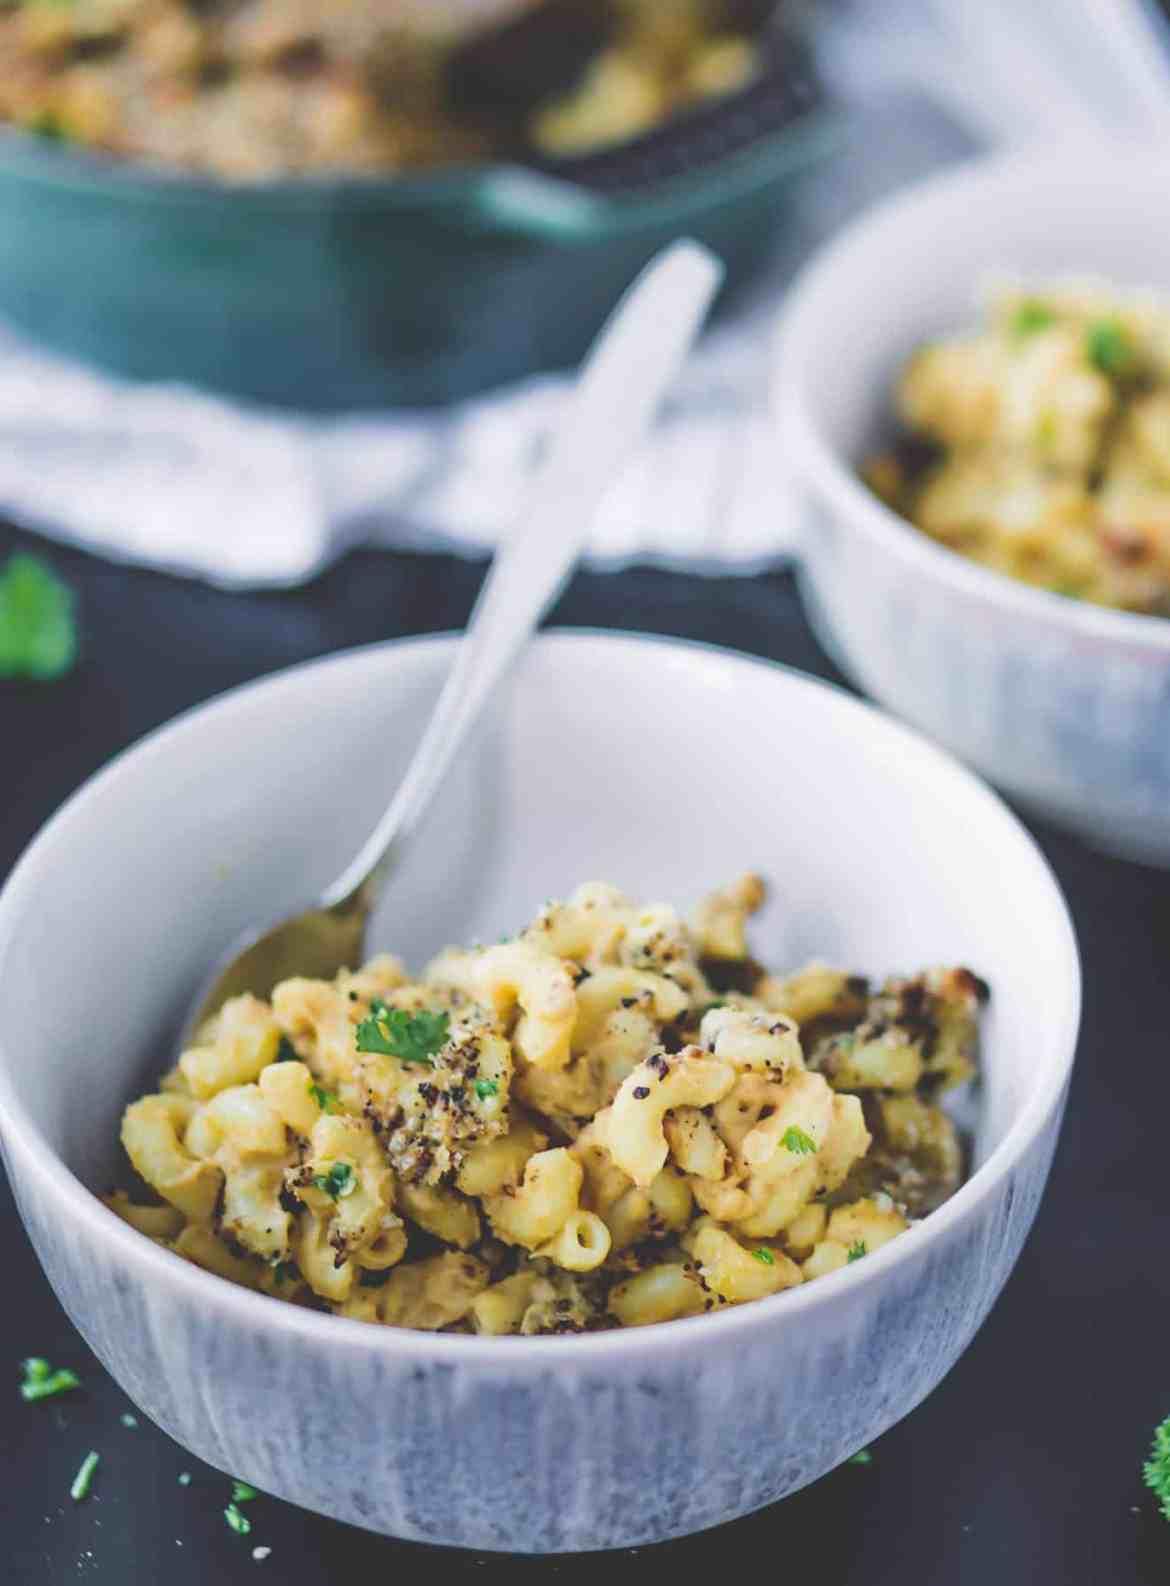 A bowl of vegan mac and cheese